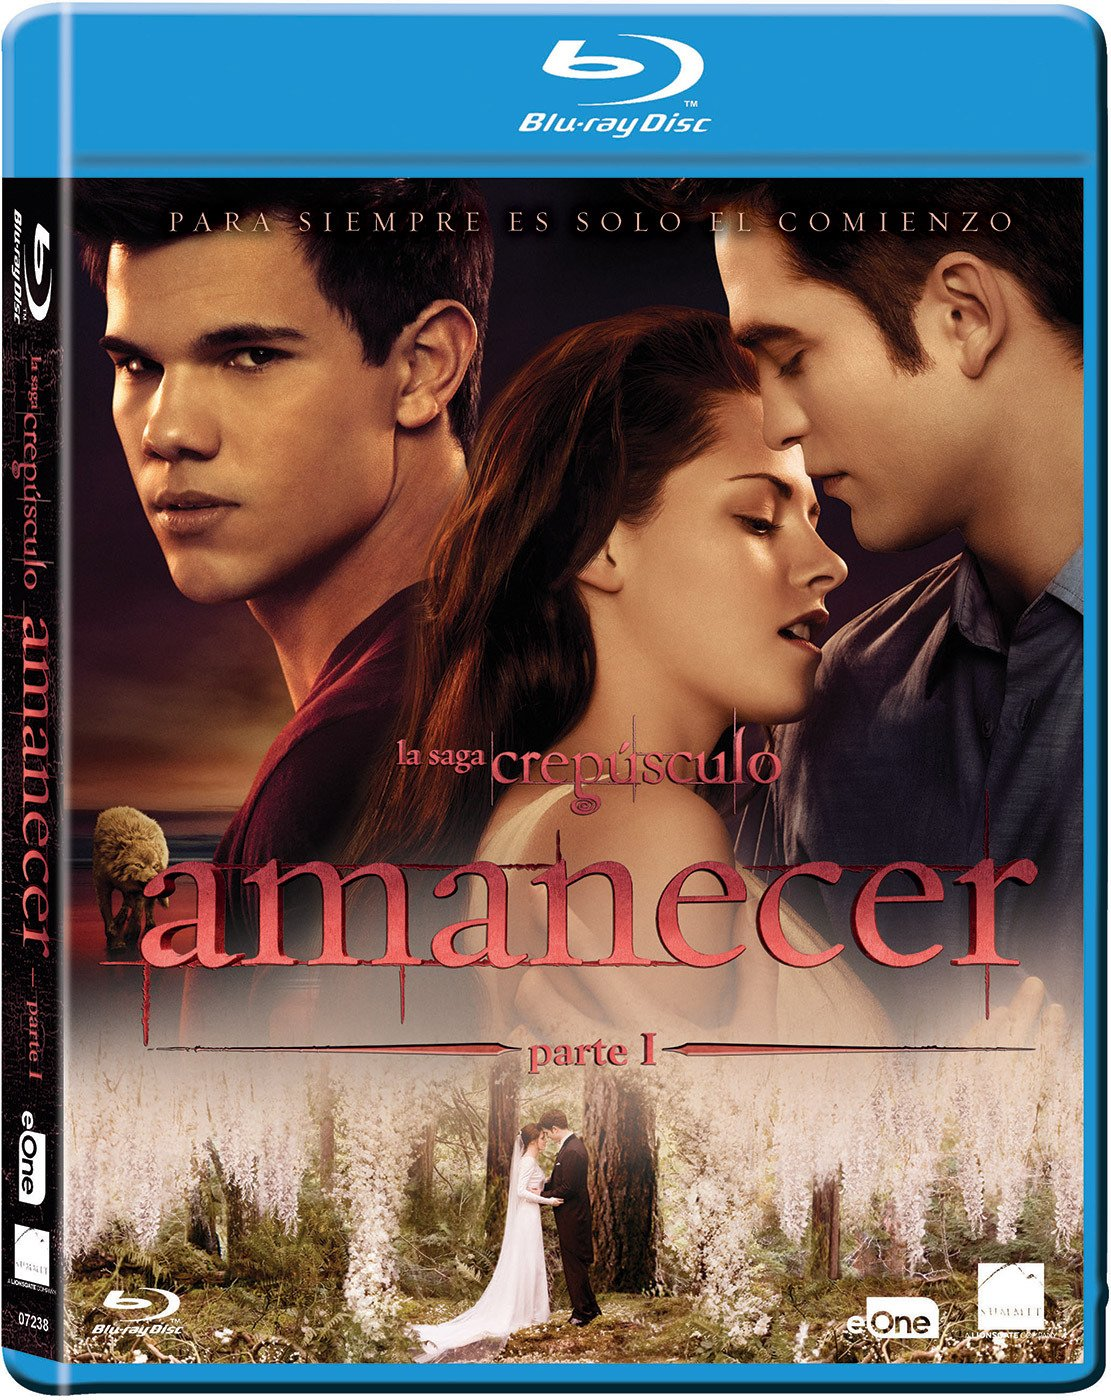 Crepusculo: Amanecer Parte 1 Blu-Ray [Blu-ray]: Amazon.es: Kristen ...